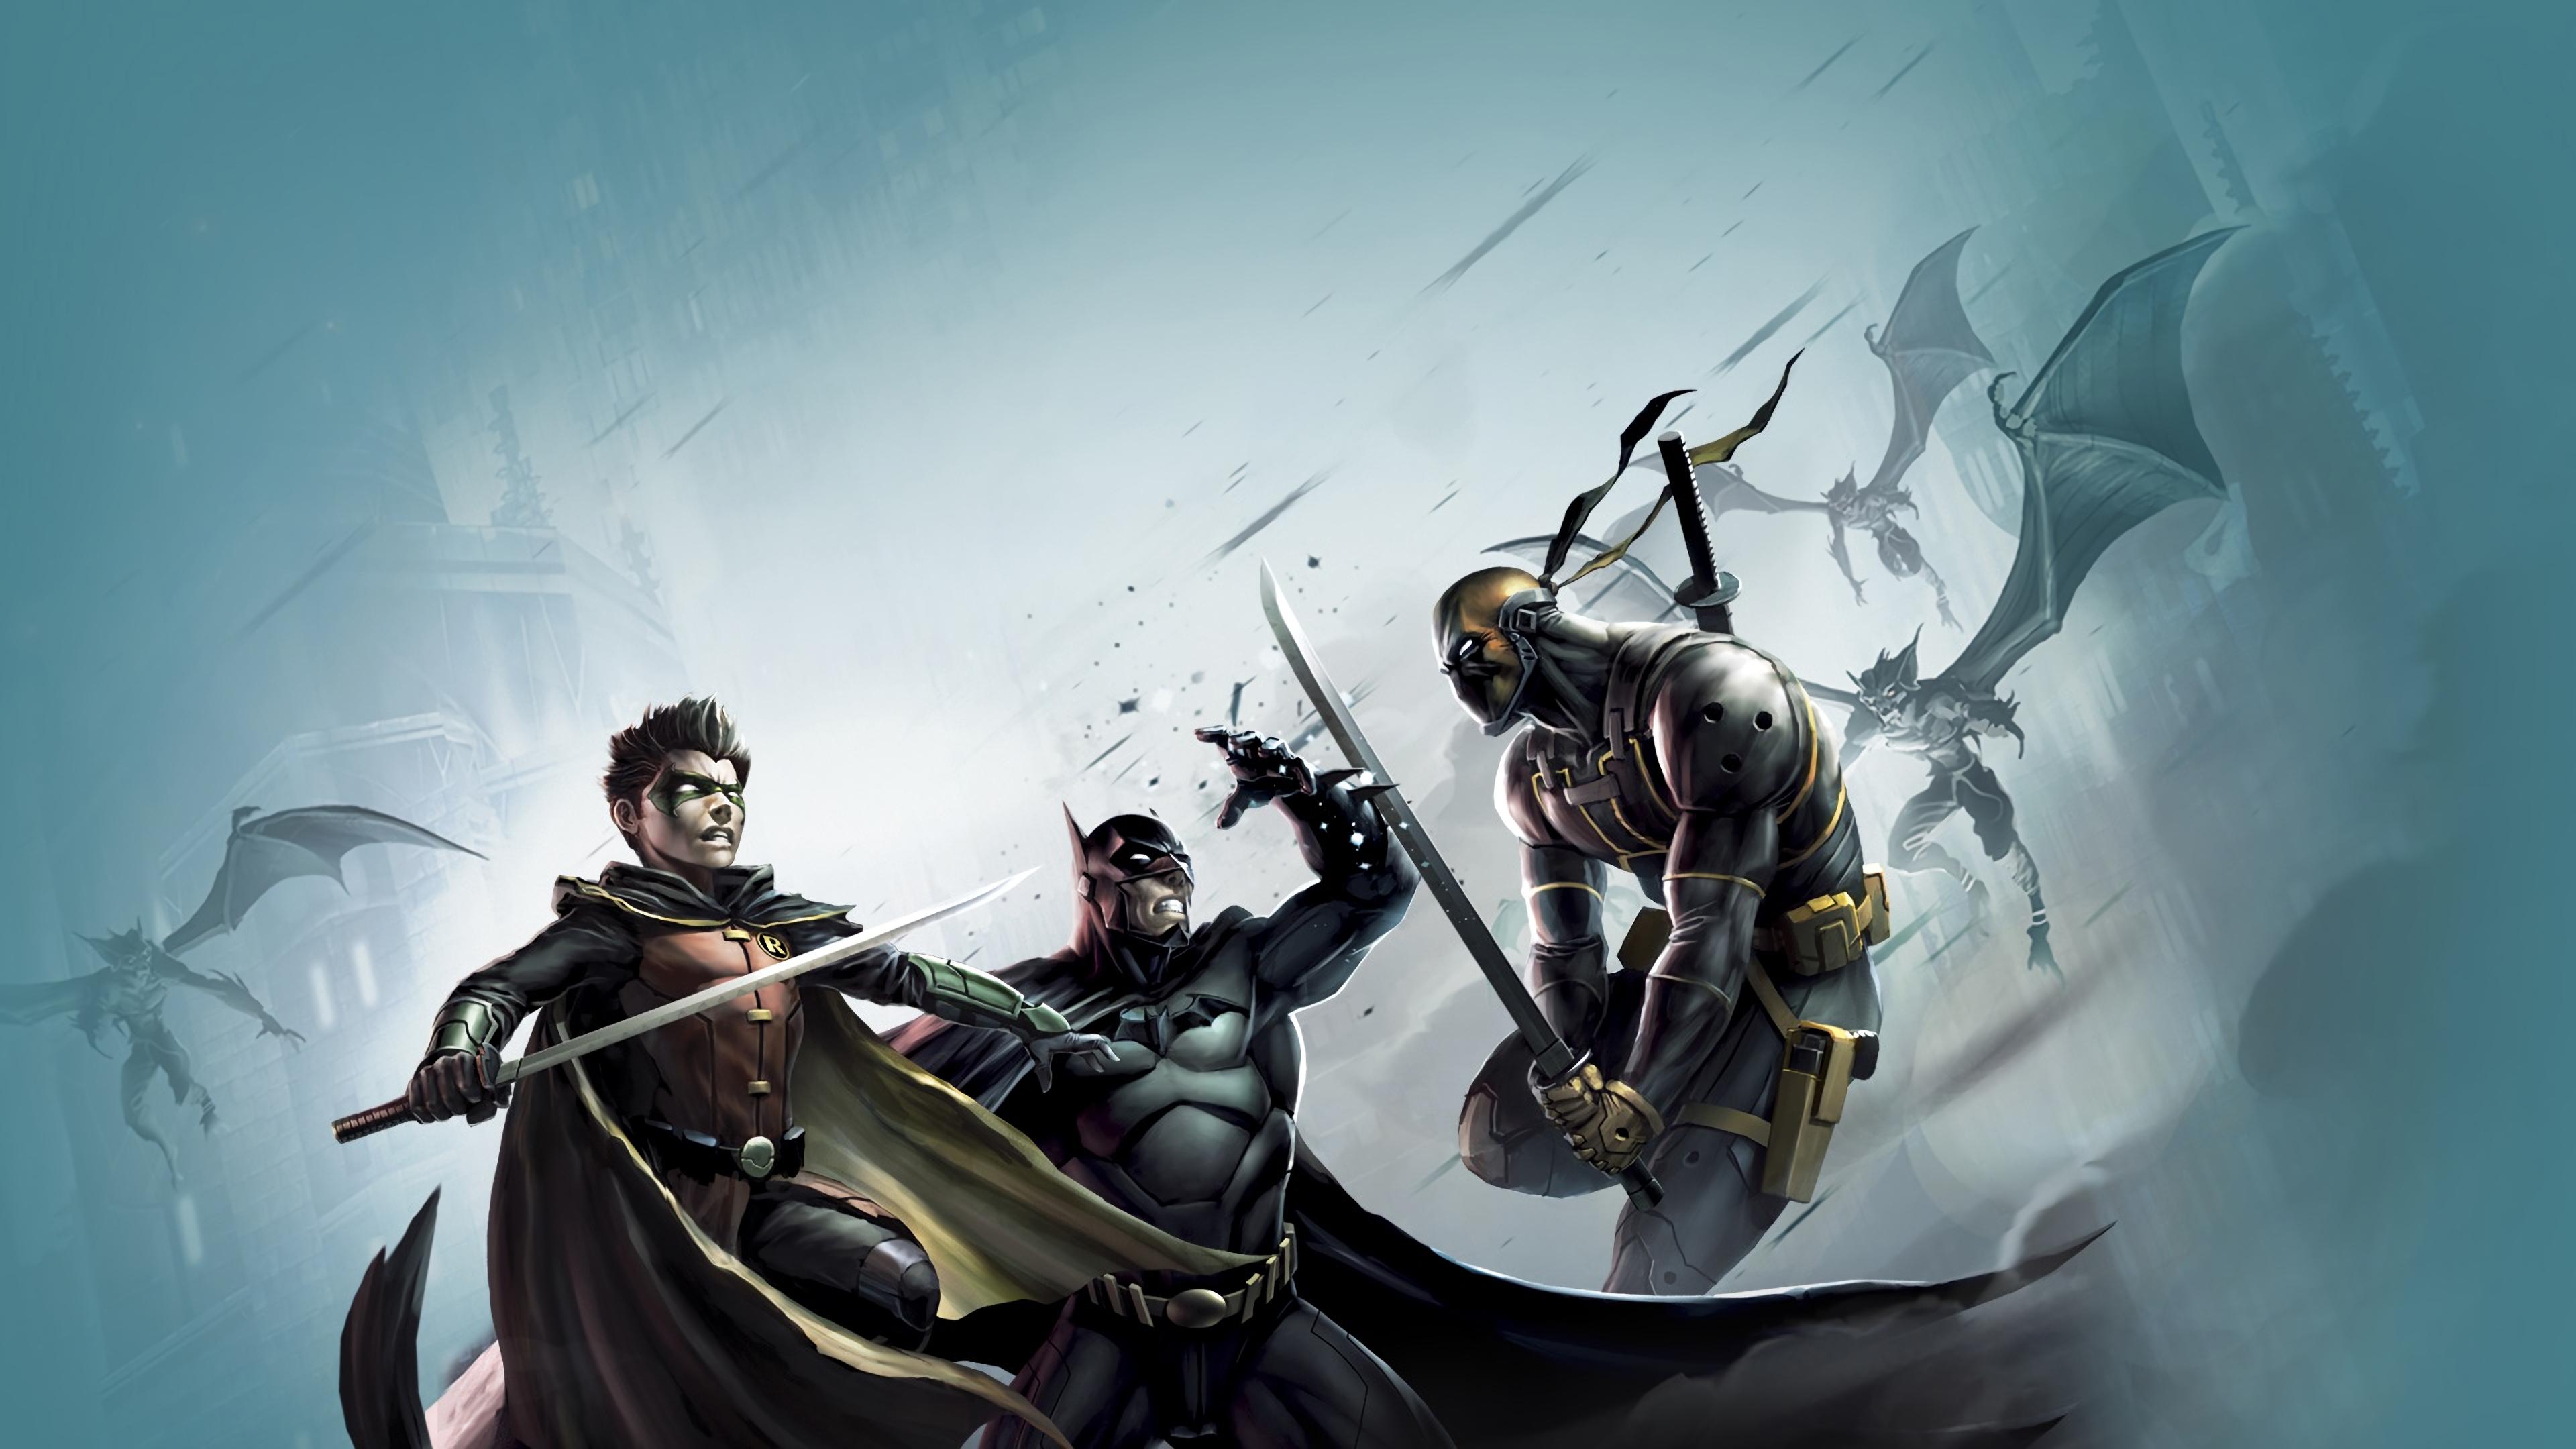 son of batman 1569186963 - Son Of Batman - superheroes wallpapers, robin wallpapers, hd-wallpapers, batman wallpapers, 4k-wallpapers